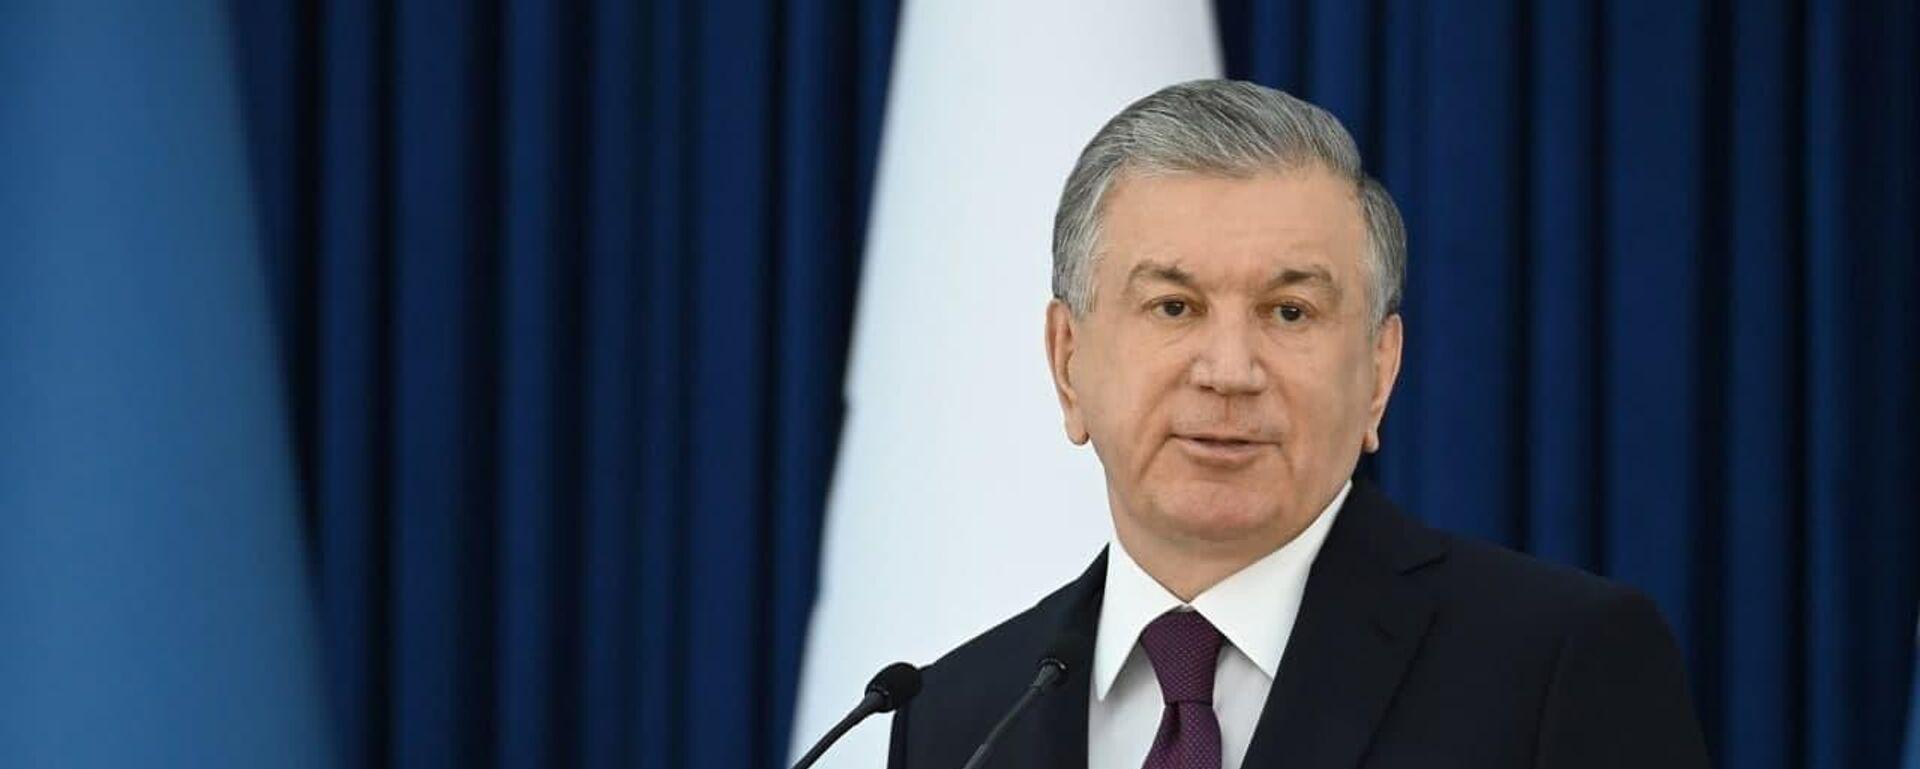 Президент Узбекистана Шавкат Мирзиёев - Sputnik Узбекистан, 1920, 11.10.2021